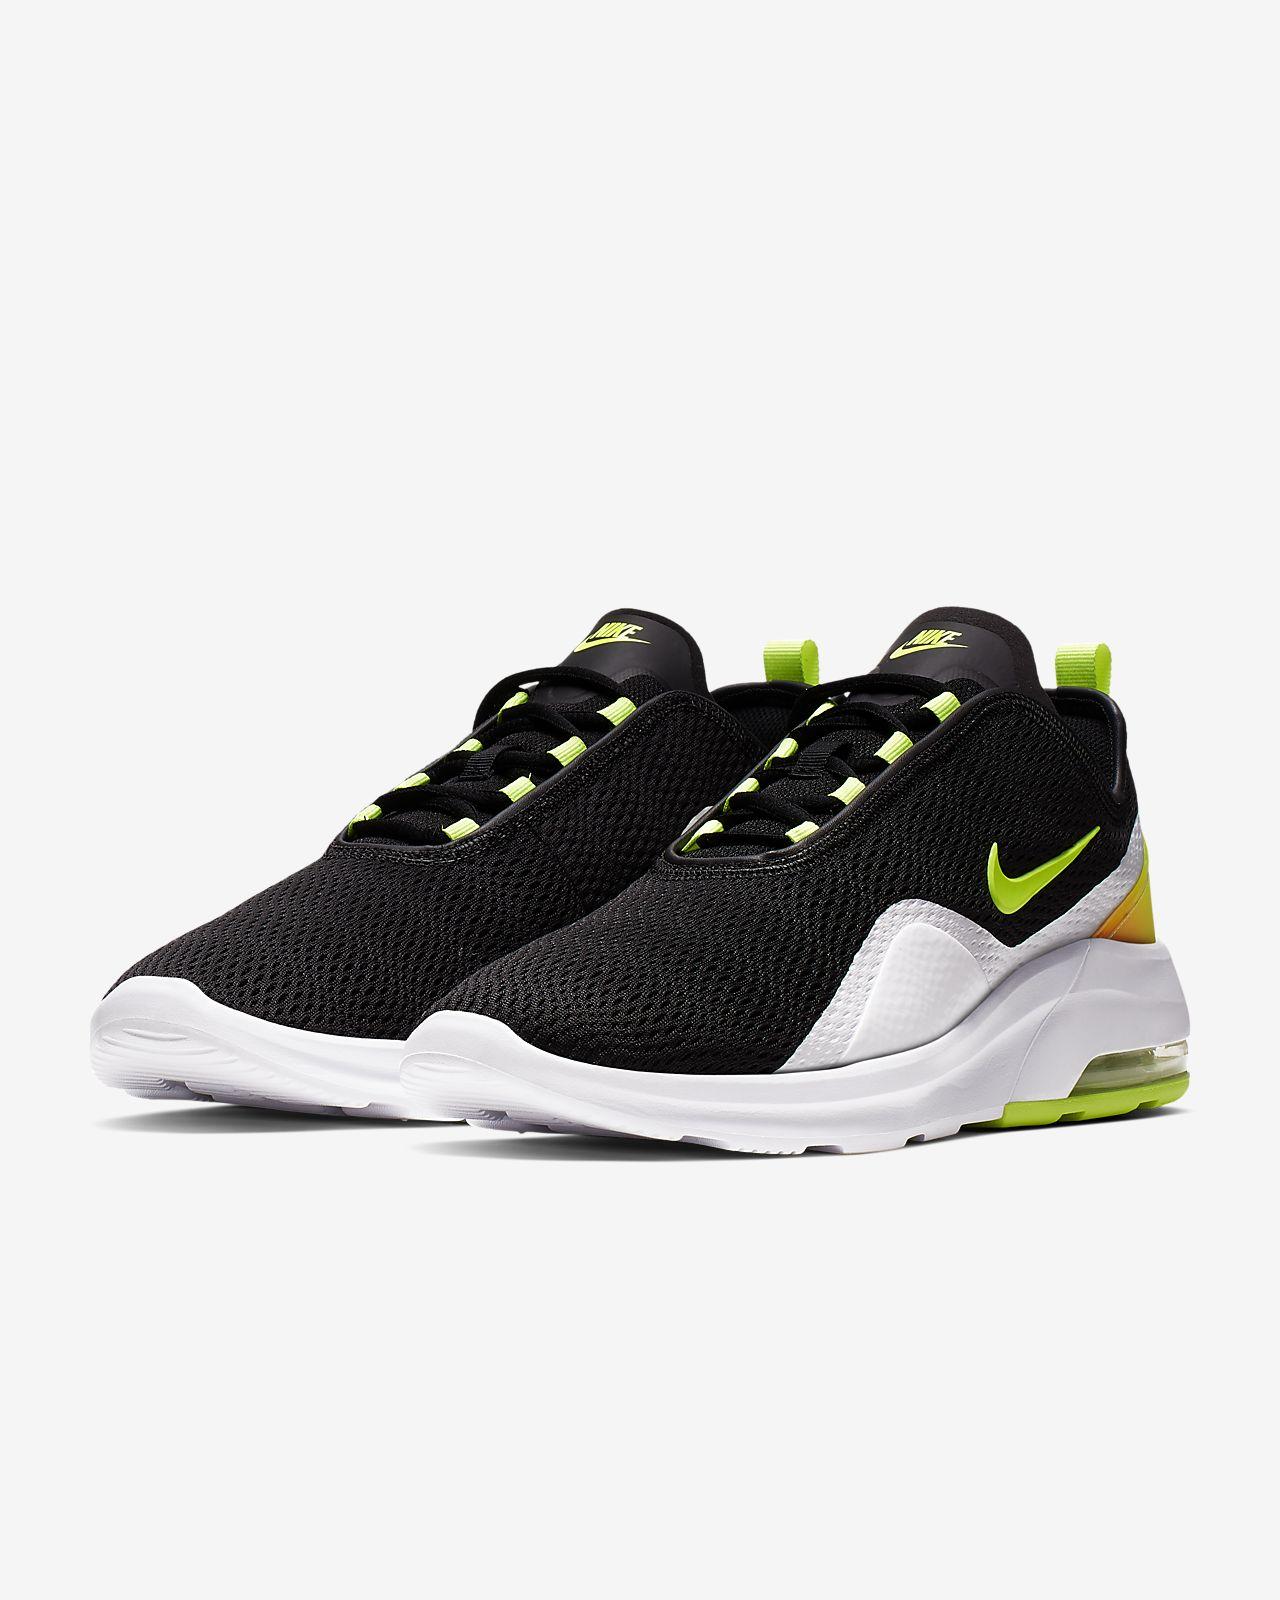 best service 47eb8 f031f ... Nike Air Max Motion 2 Men s Shoe